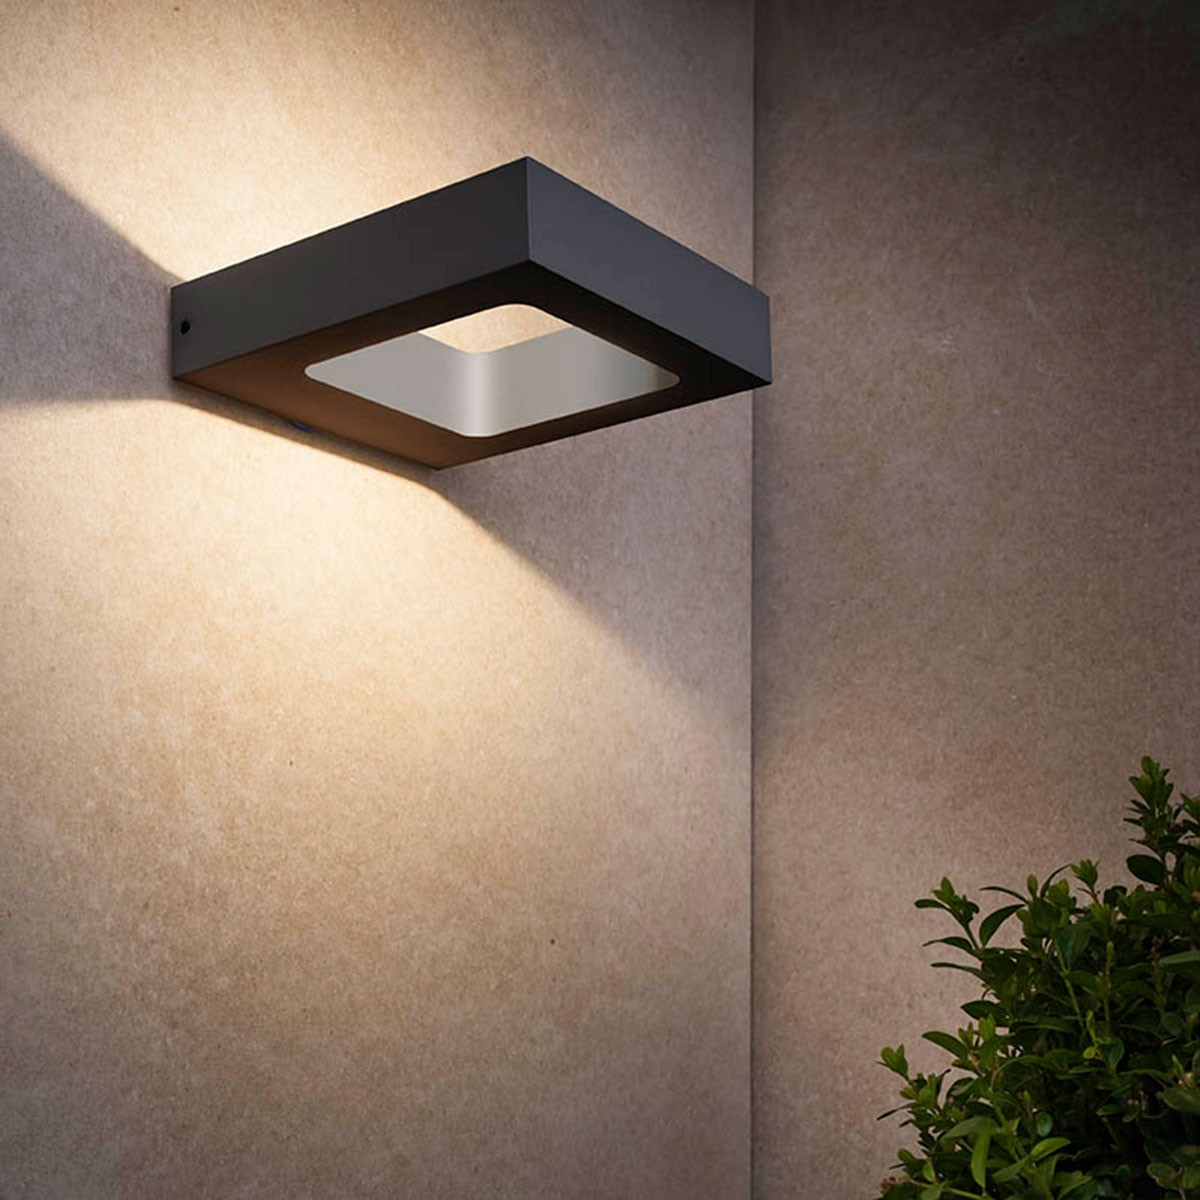 MyLight Carre LED Wandleuchte, schwarz